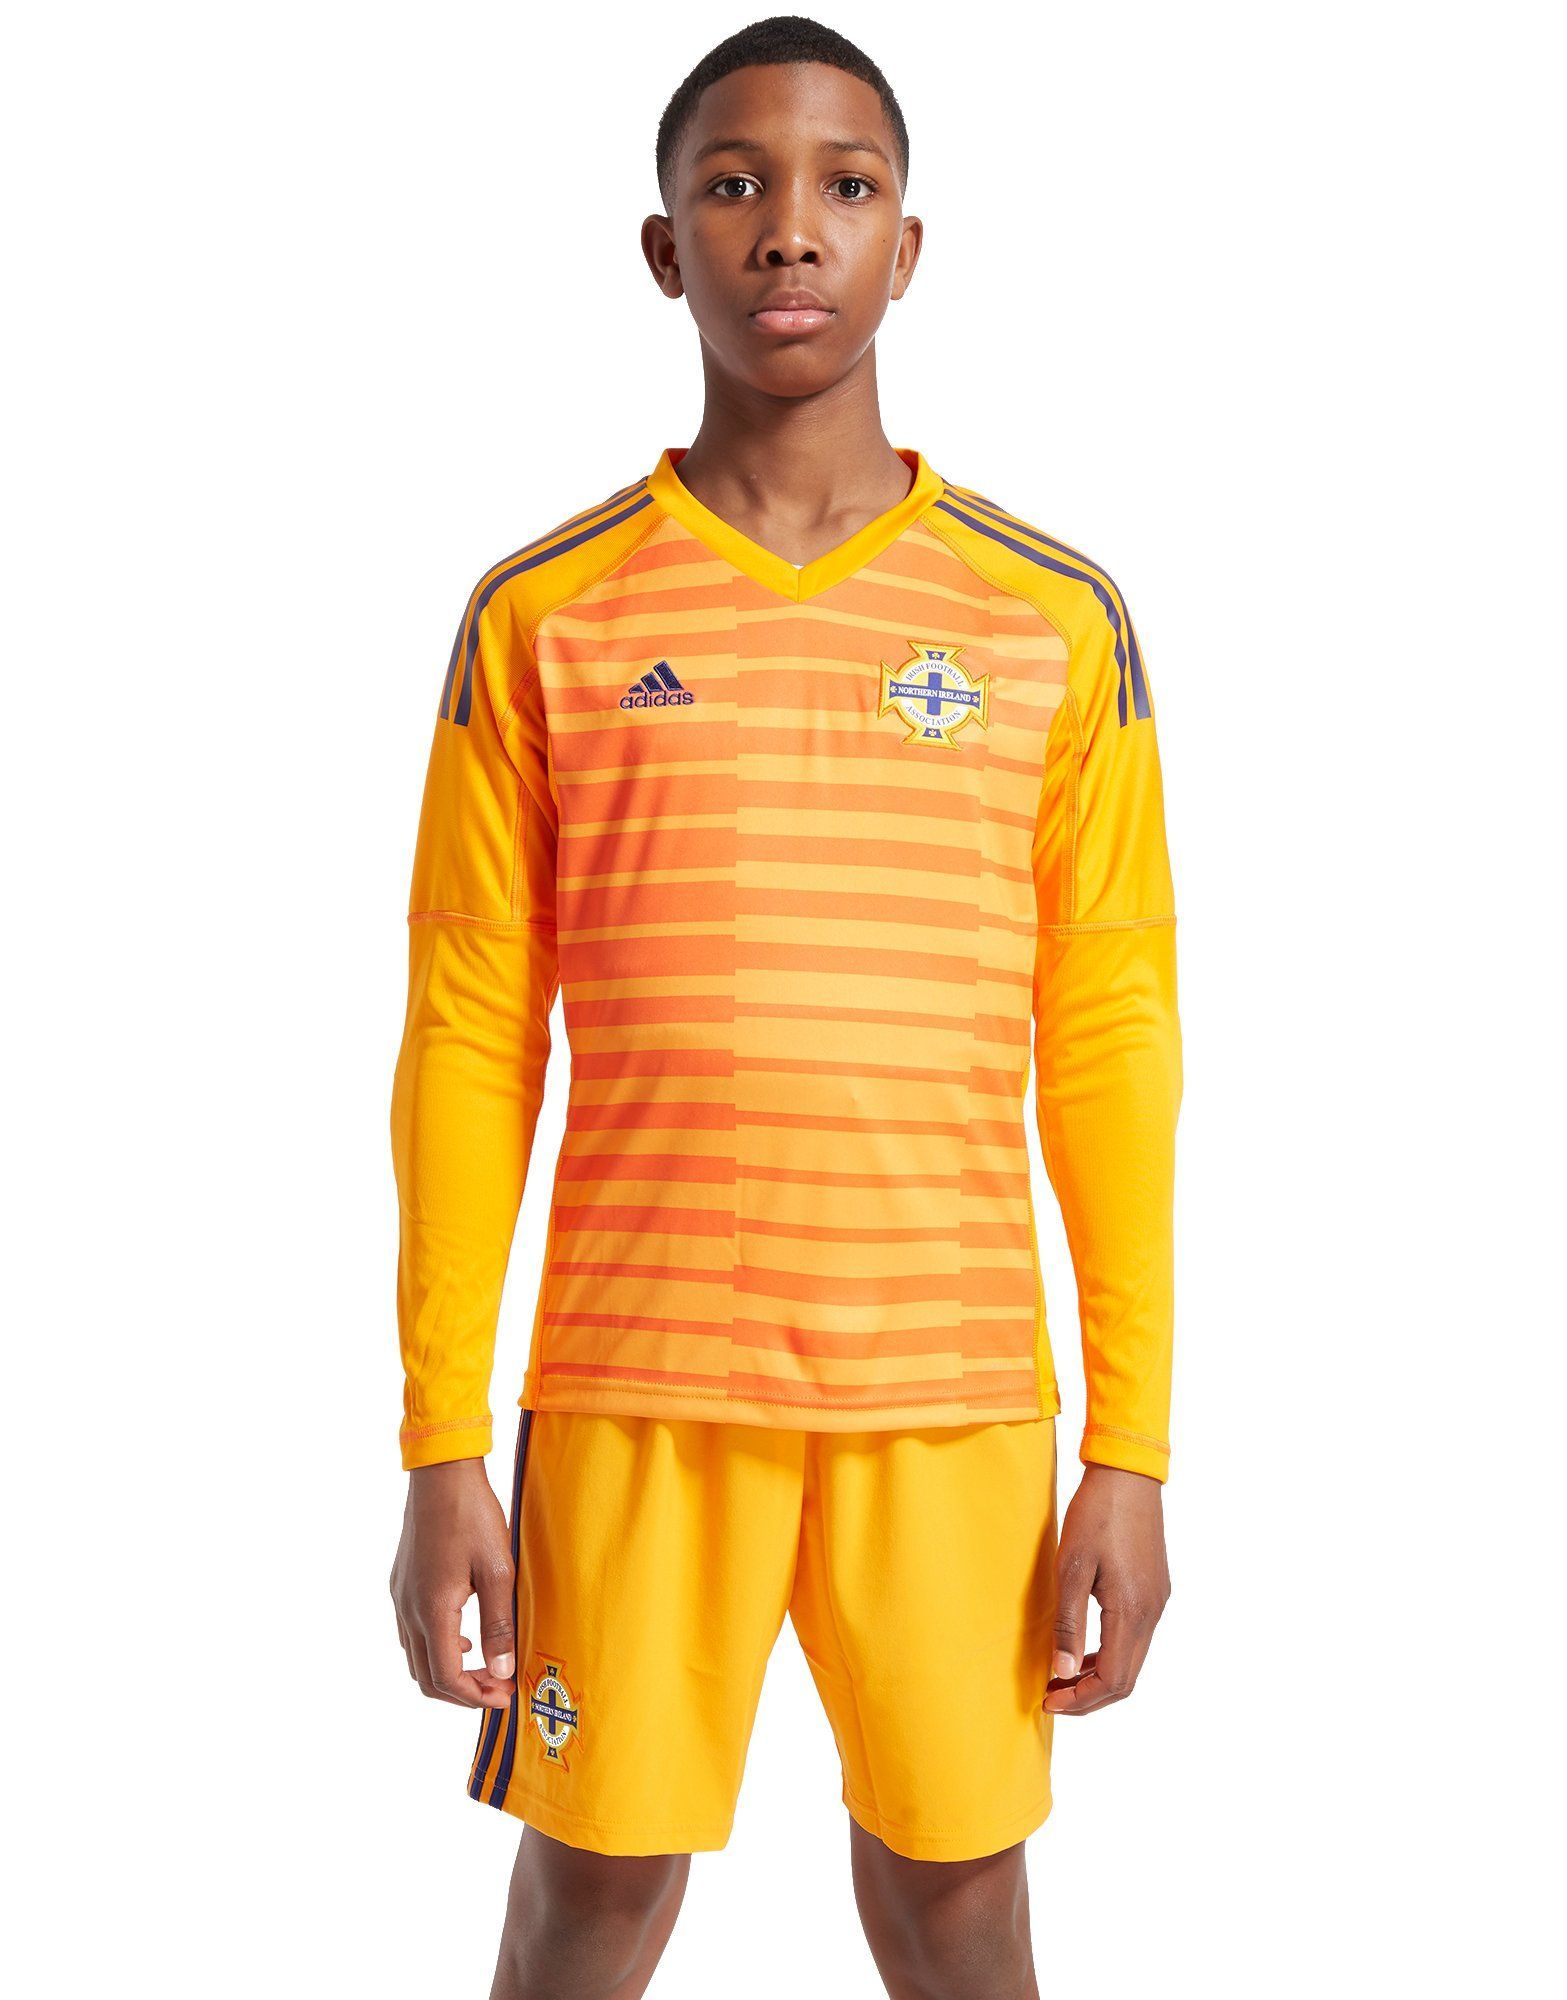 adidas Northern Ireland 18/19 Home Goal Keeper Shirt Jnr